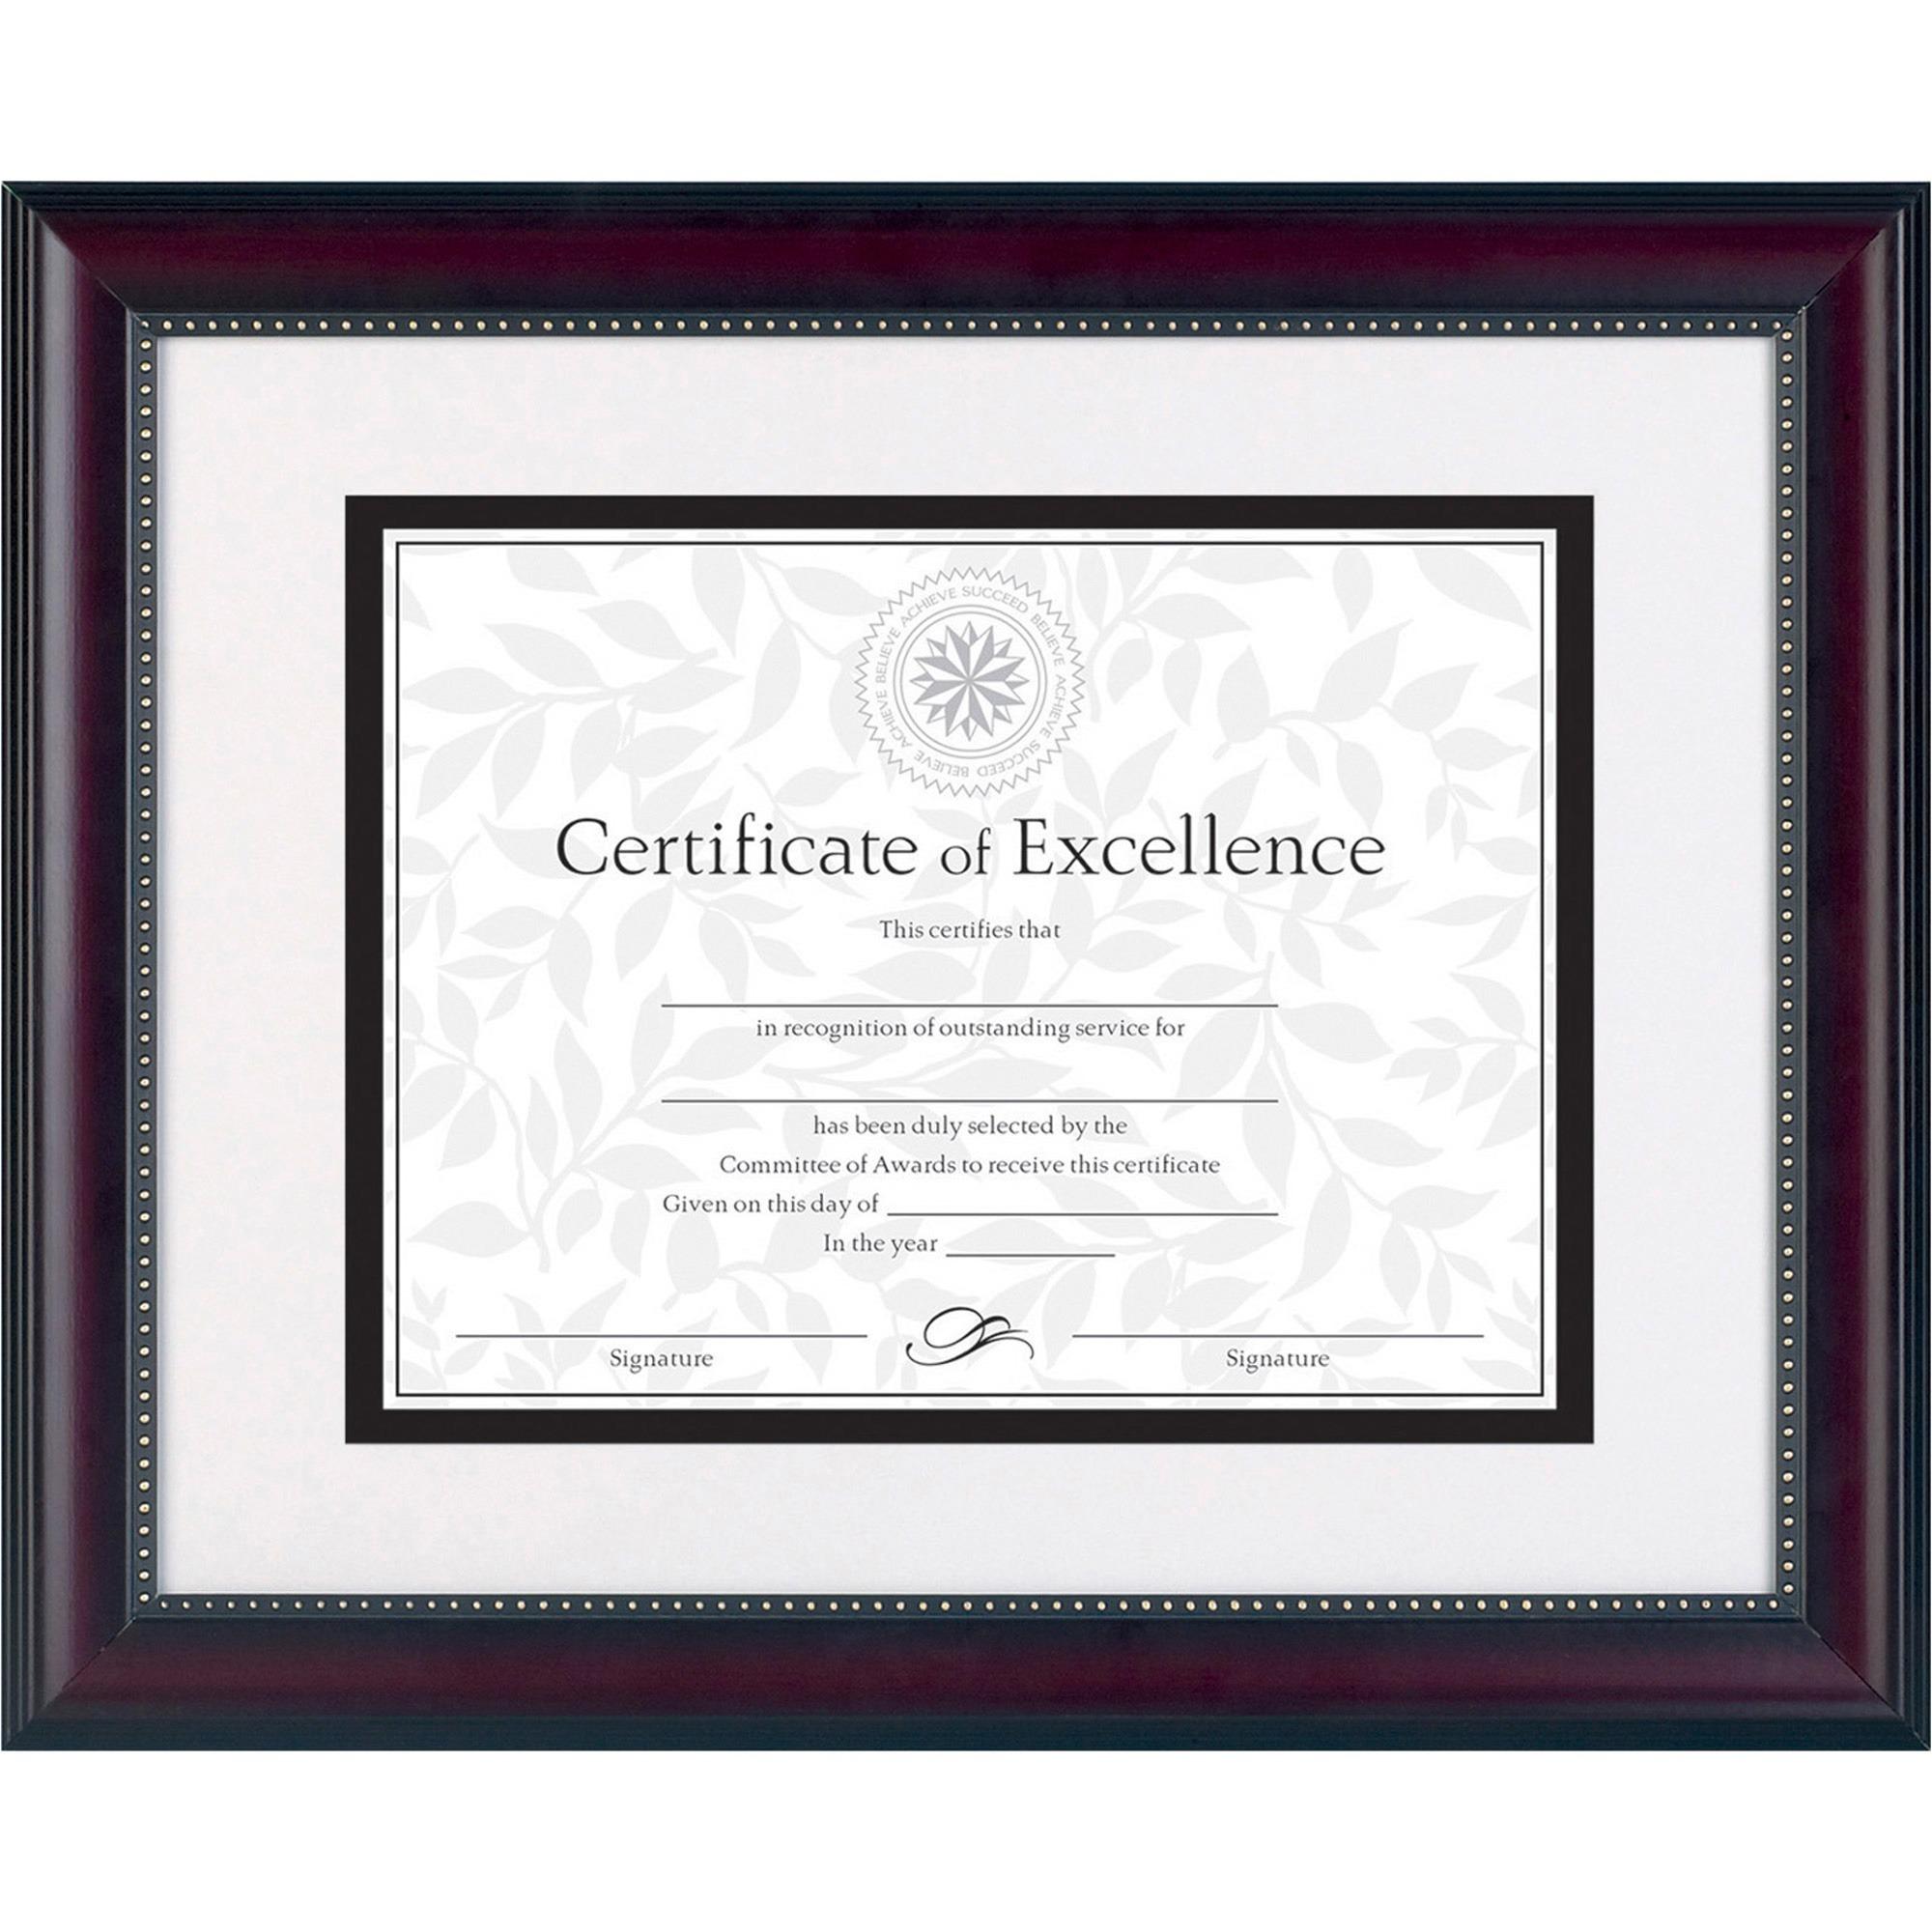 DAX Prestige Document Frame, Matted w/Cert, Rosewood/Black, 11 x 14, 8 1/2 x 11